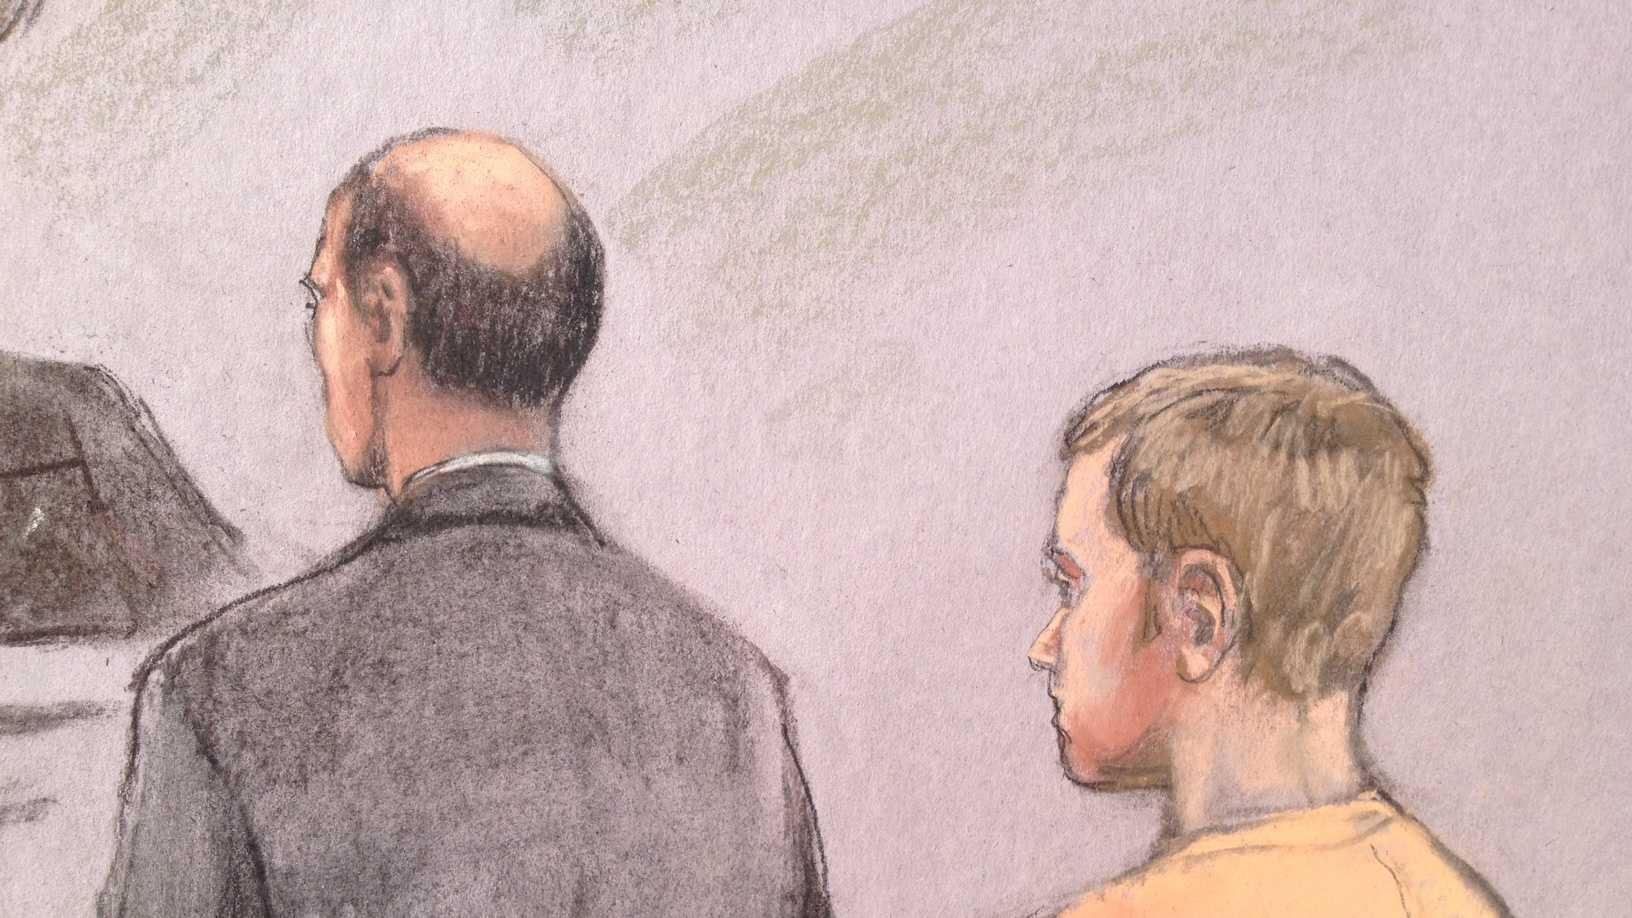 Casey James Fury courtroom sketch